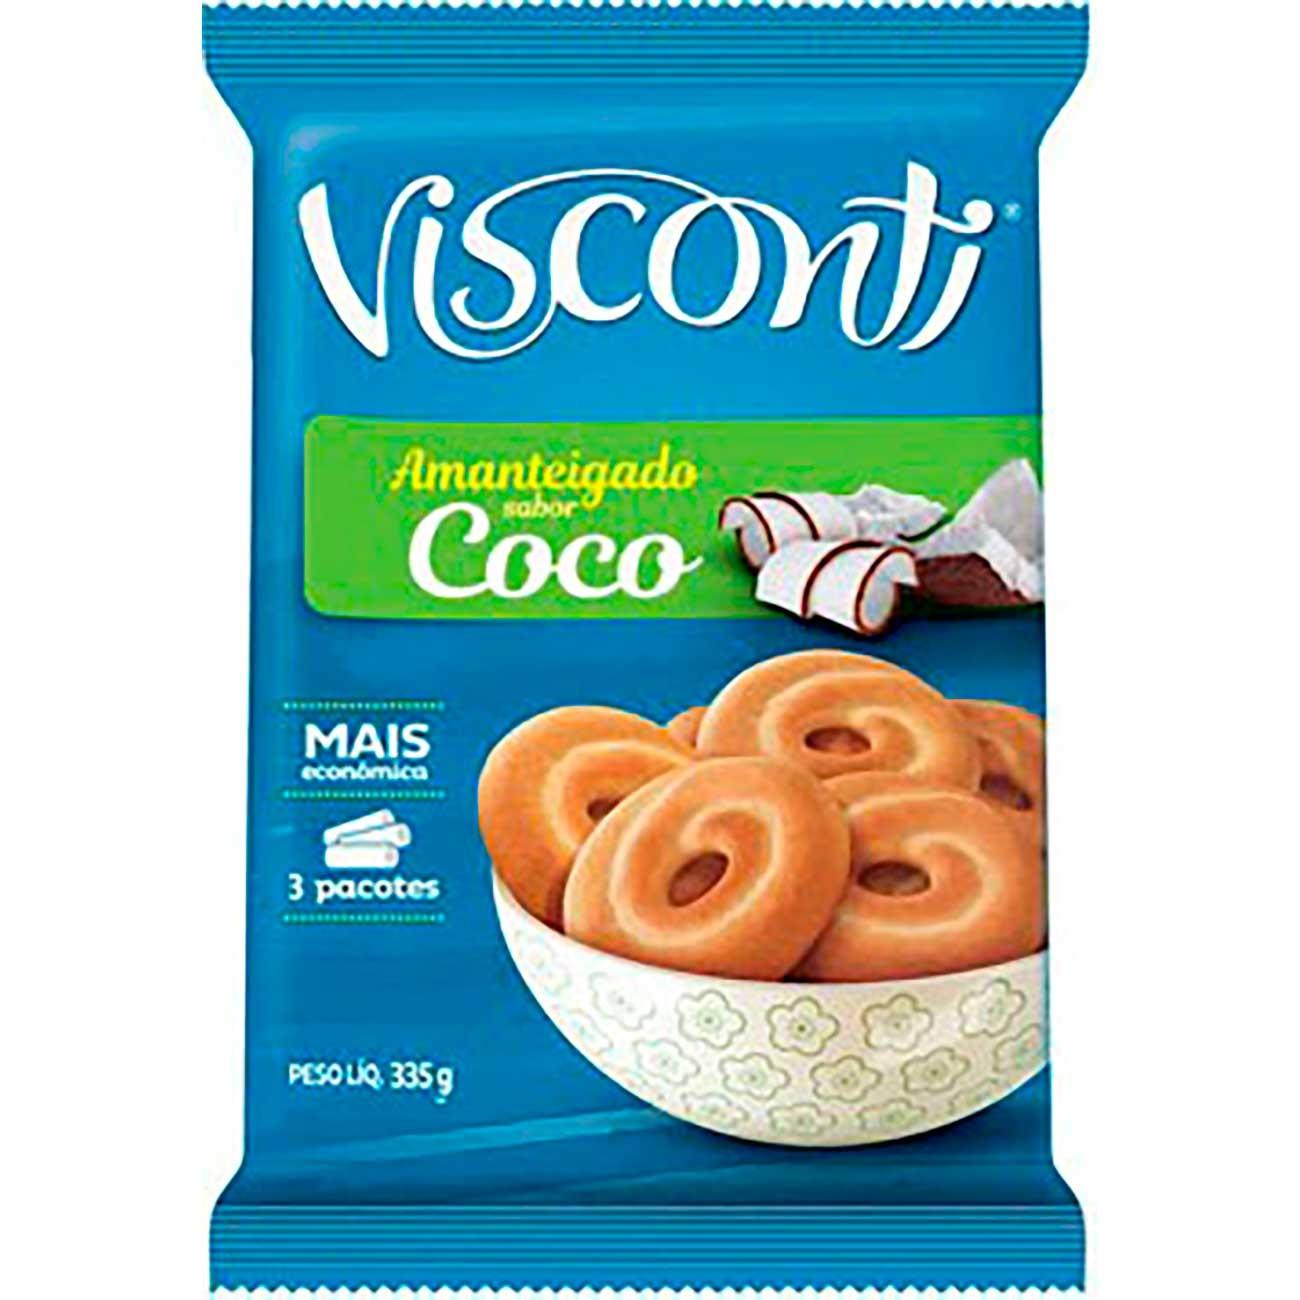 Biscoito Visconti Amantegado Coco 330g| Caixa com 24 unidades